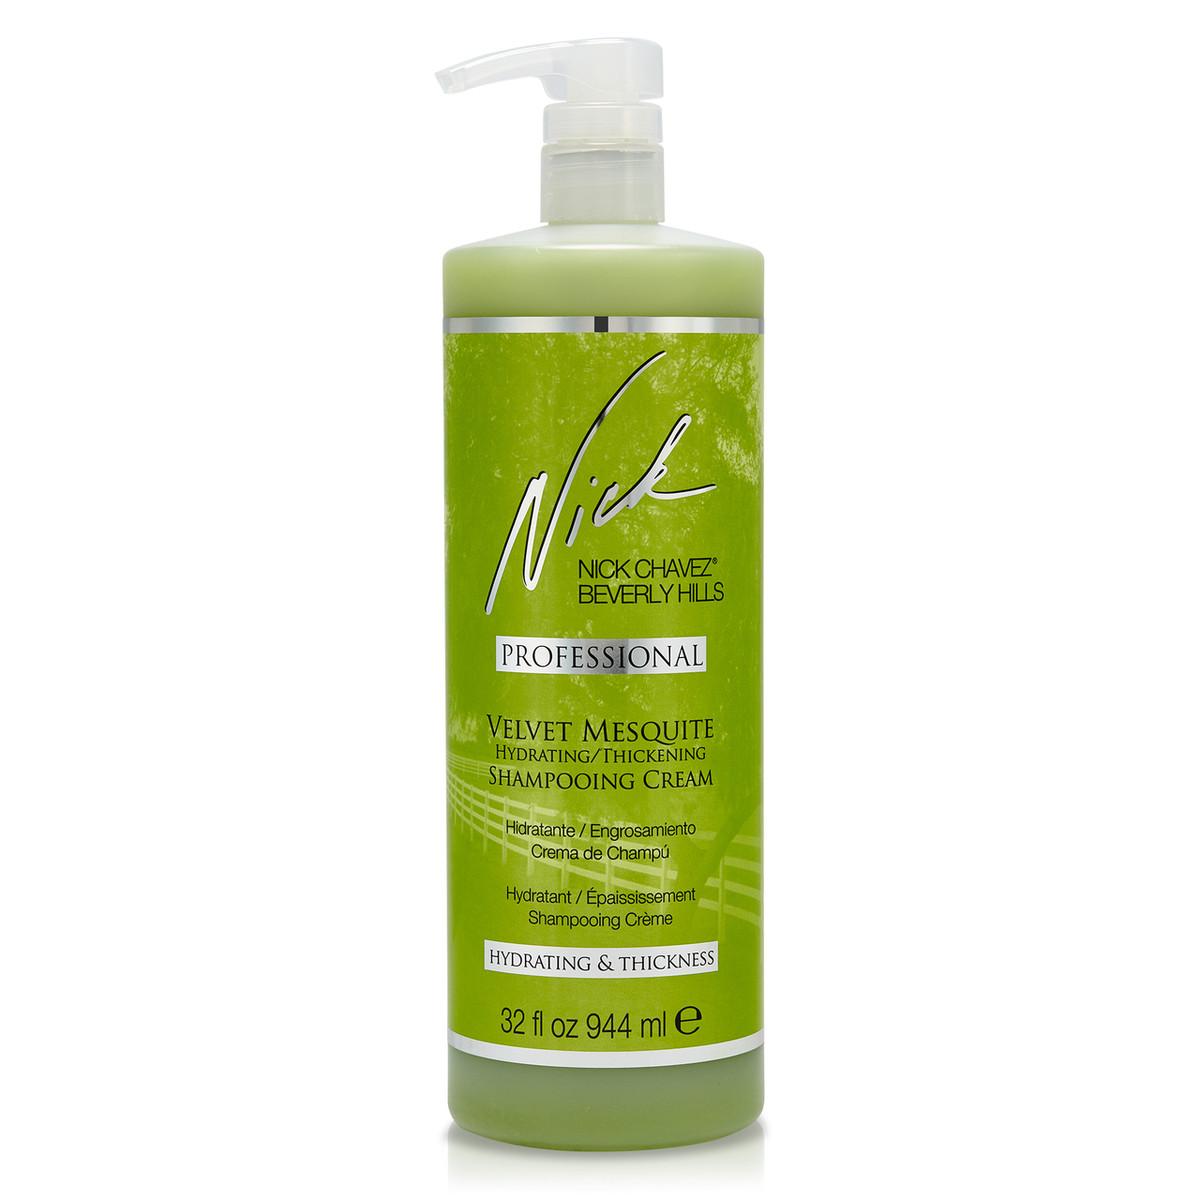 Velvet Mesquite Hydrating Thickening Shampooing Creme 32oz